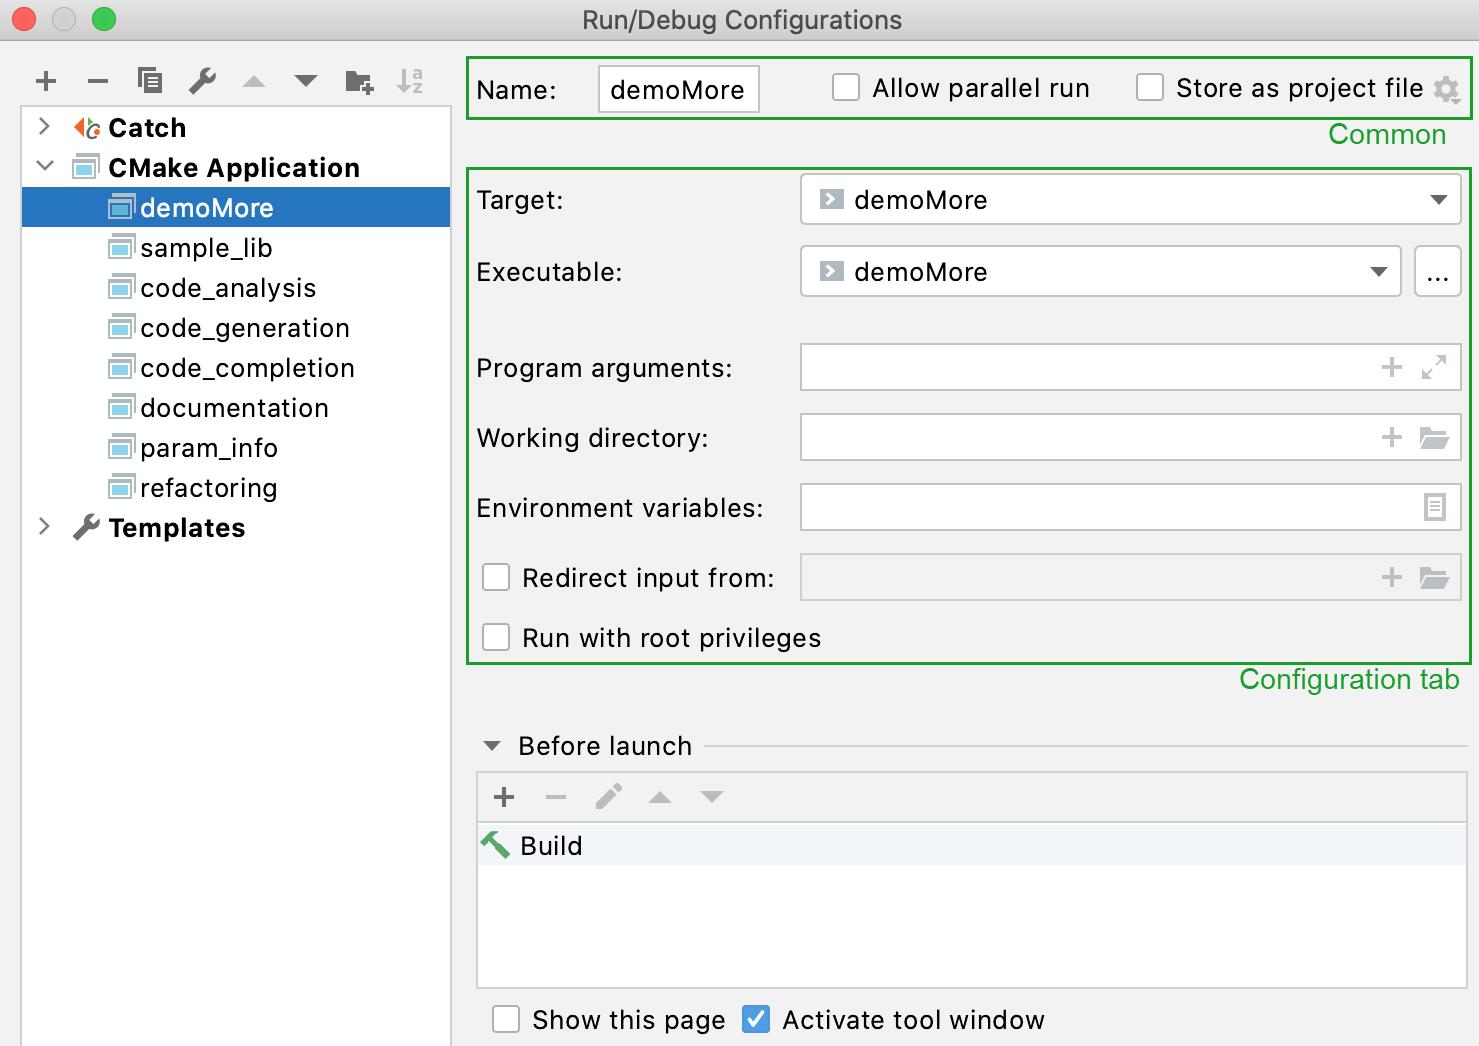 CMake Application configuration